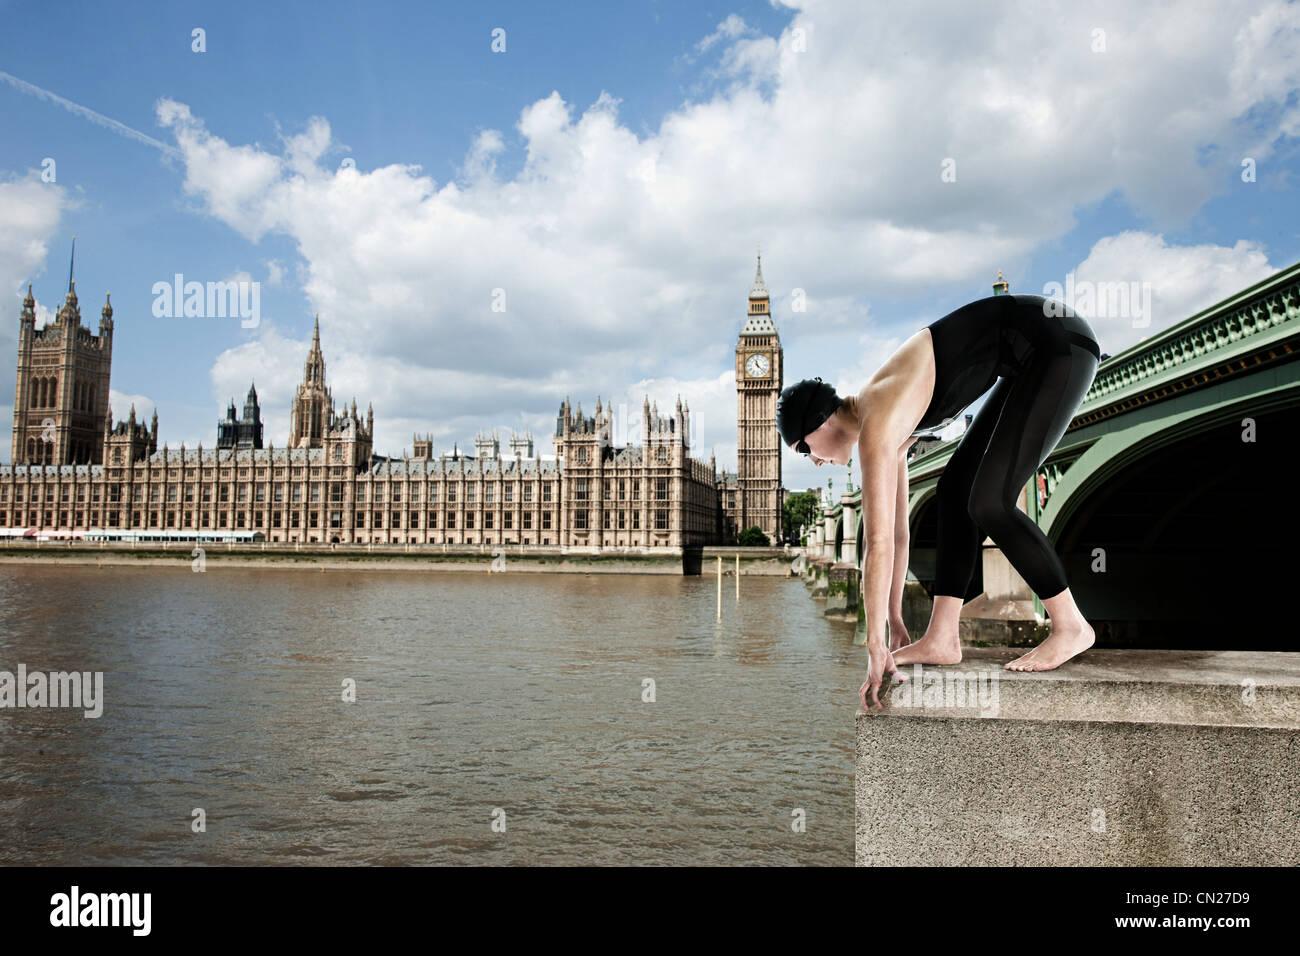 Swimmer diving off Westminster Bridge, London, England - Stock Image